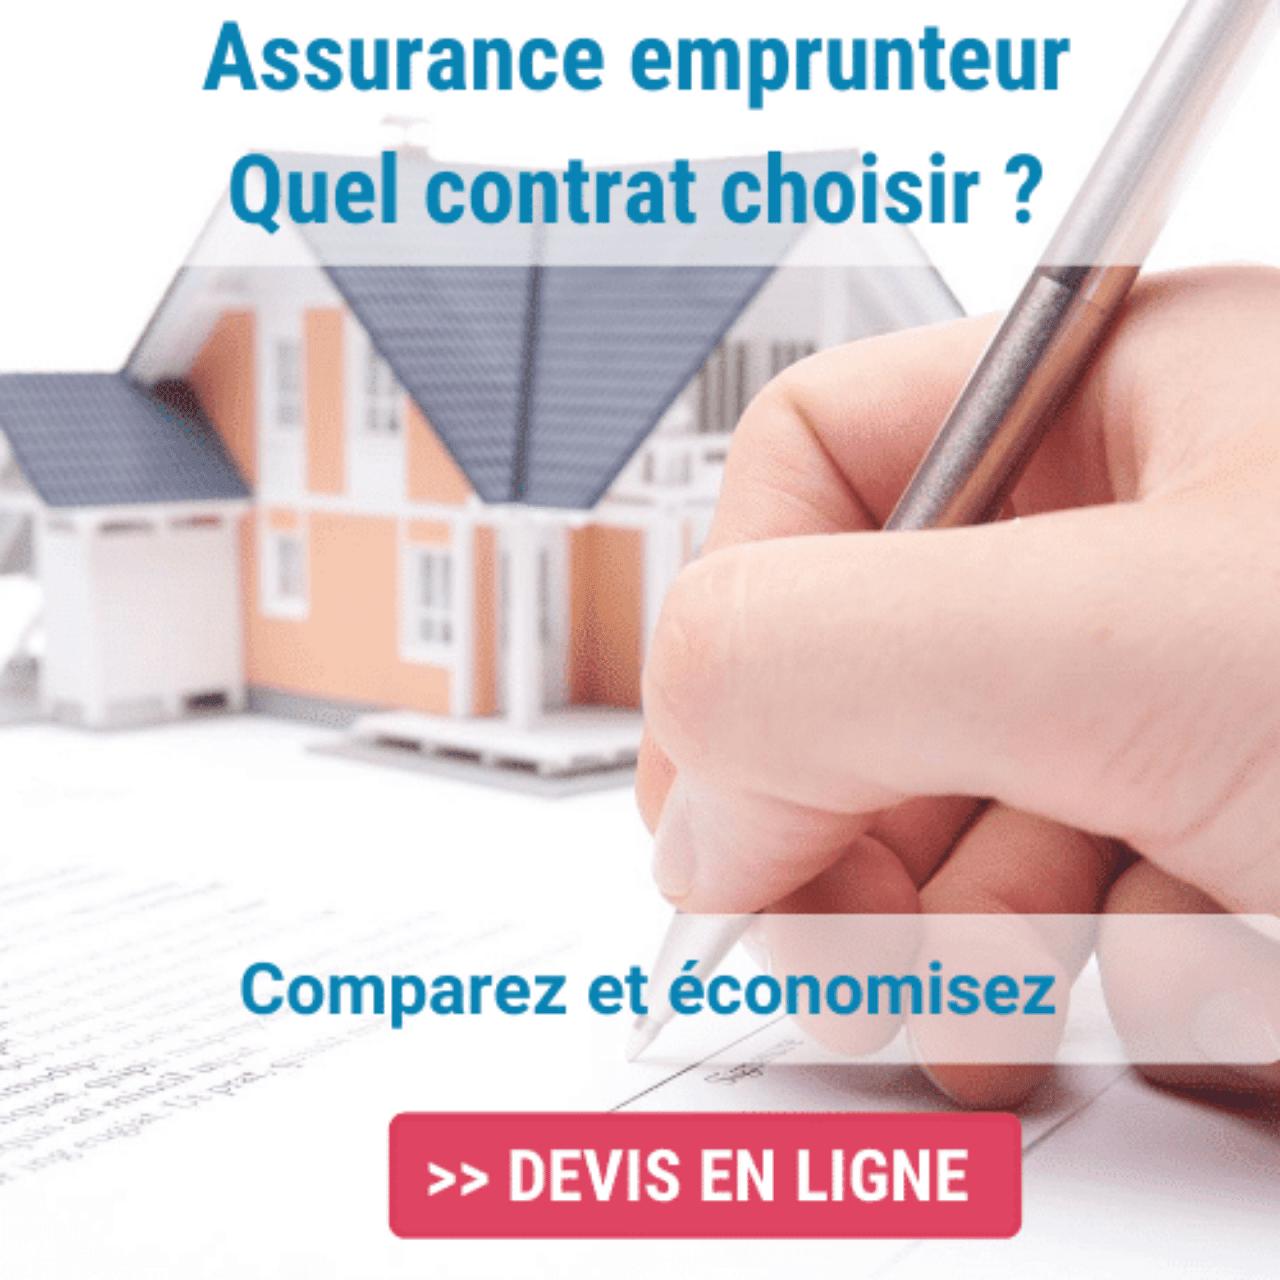 Contrat-assurance-emprunteur-collectif-ou-individuel.png